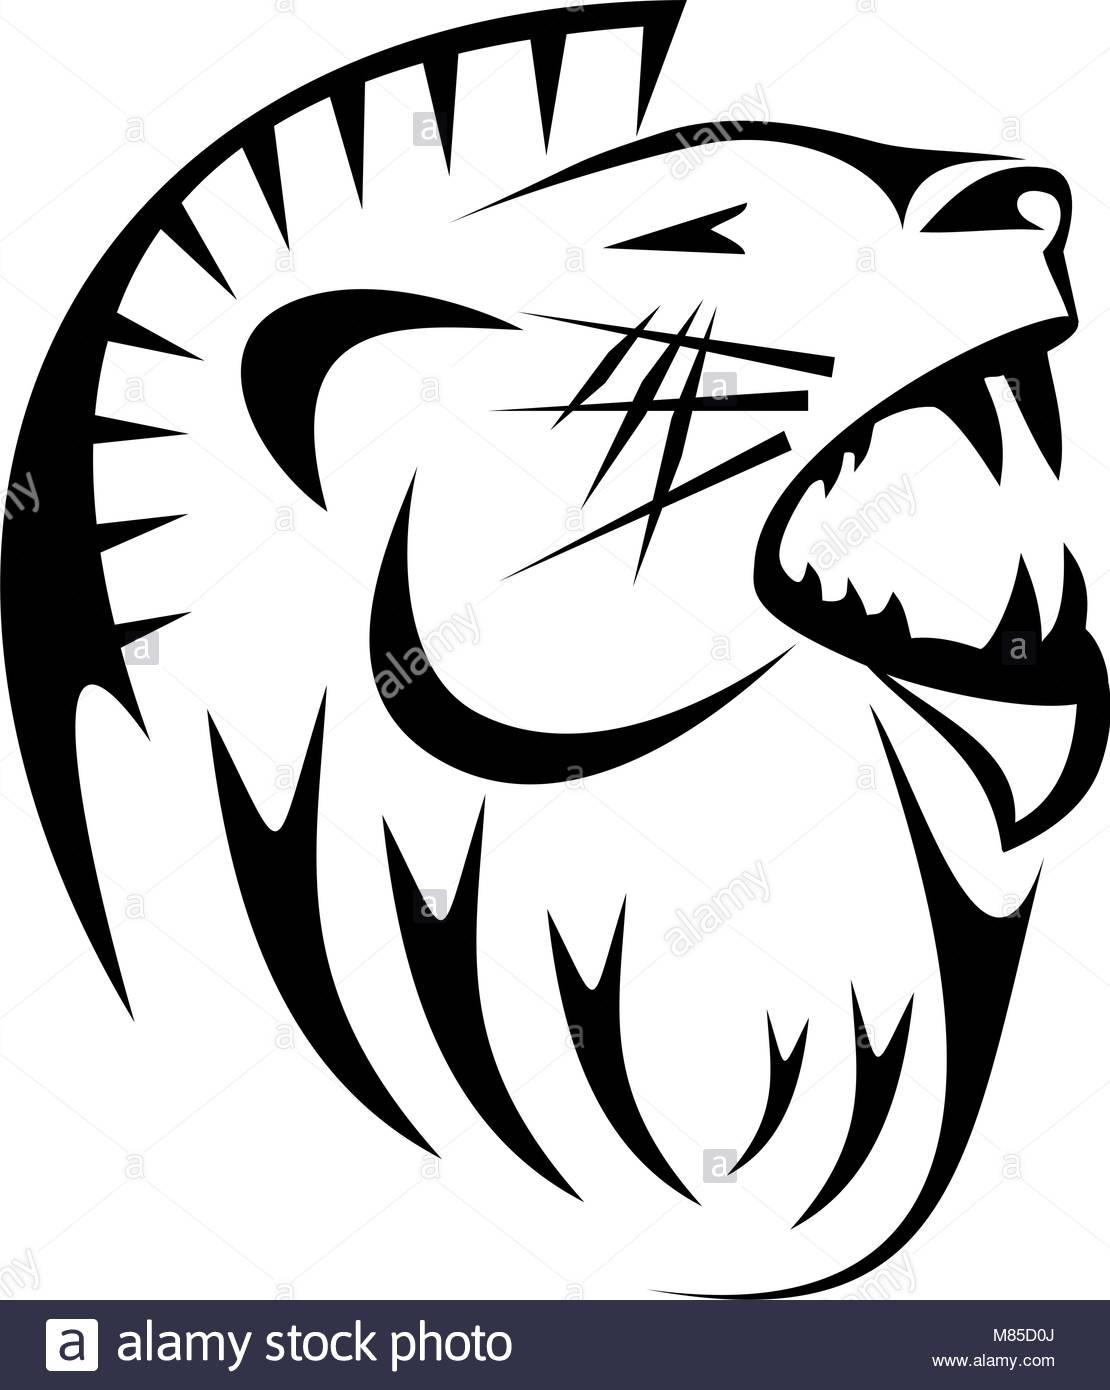 1110x1390 Lion Tattoo Stock Photos Amp Lion Tattoo Stock Images